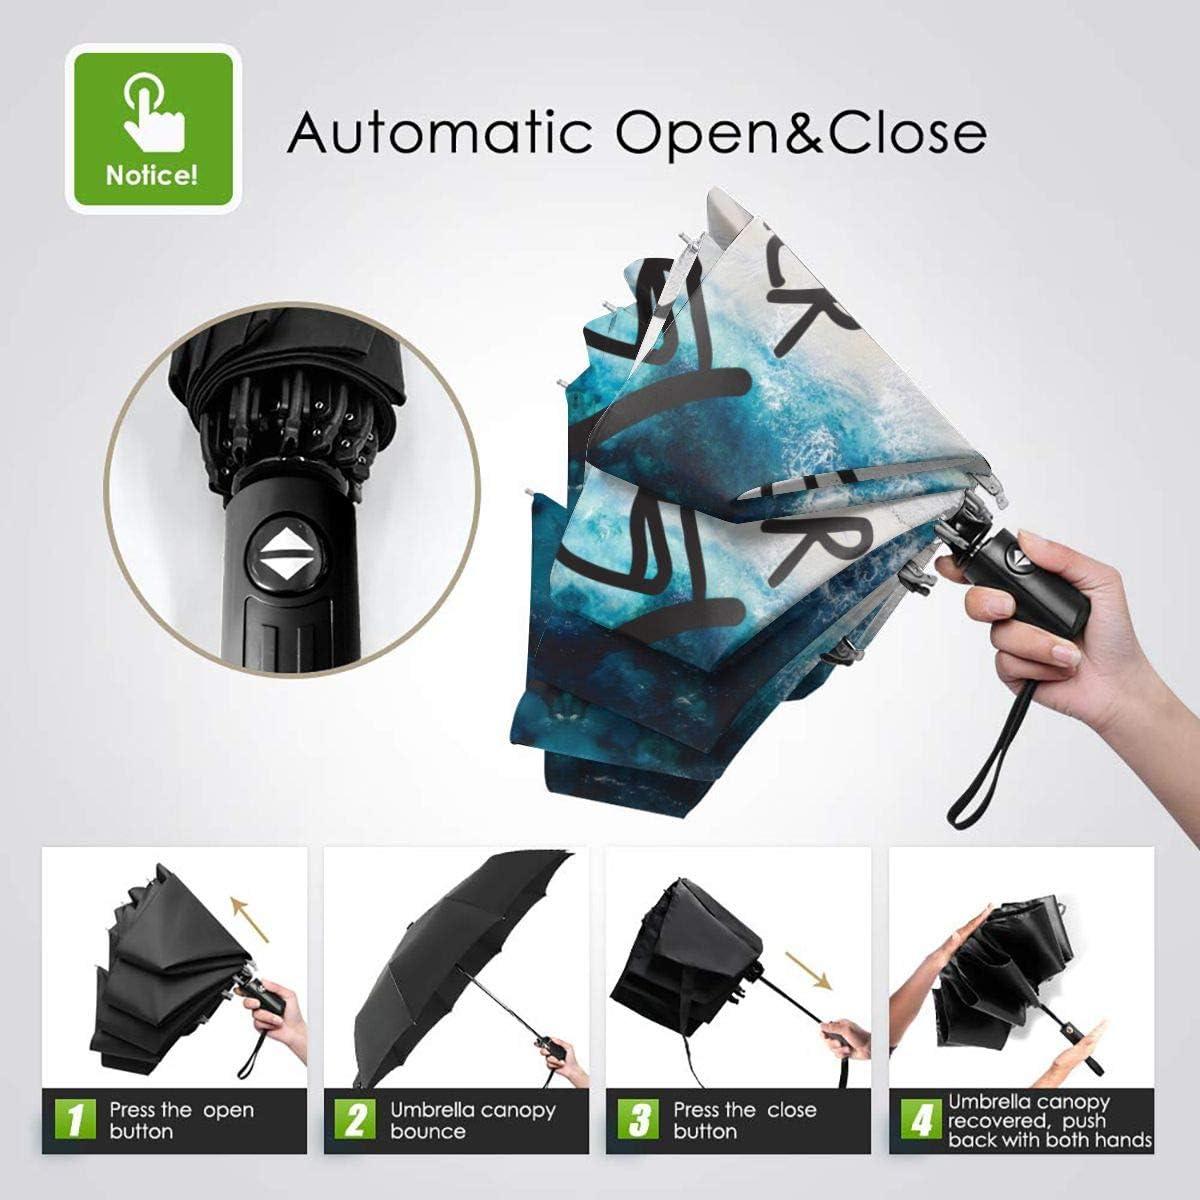 XinGanXian007 Unisex Dont Be A Sucker Novelty Windproof Auto Tri-Fold Umbrella for Outdoor